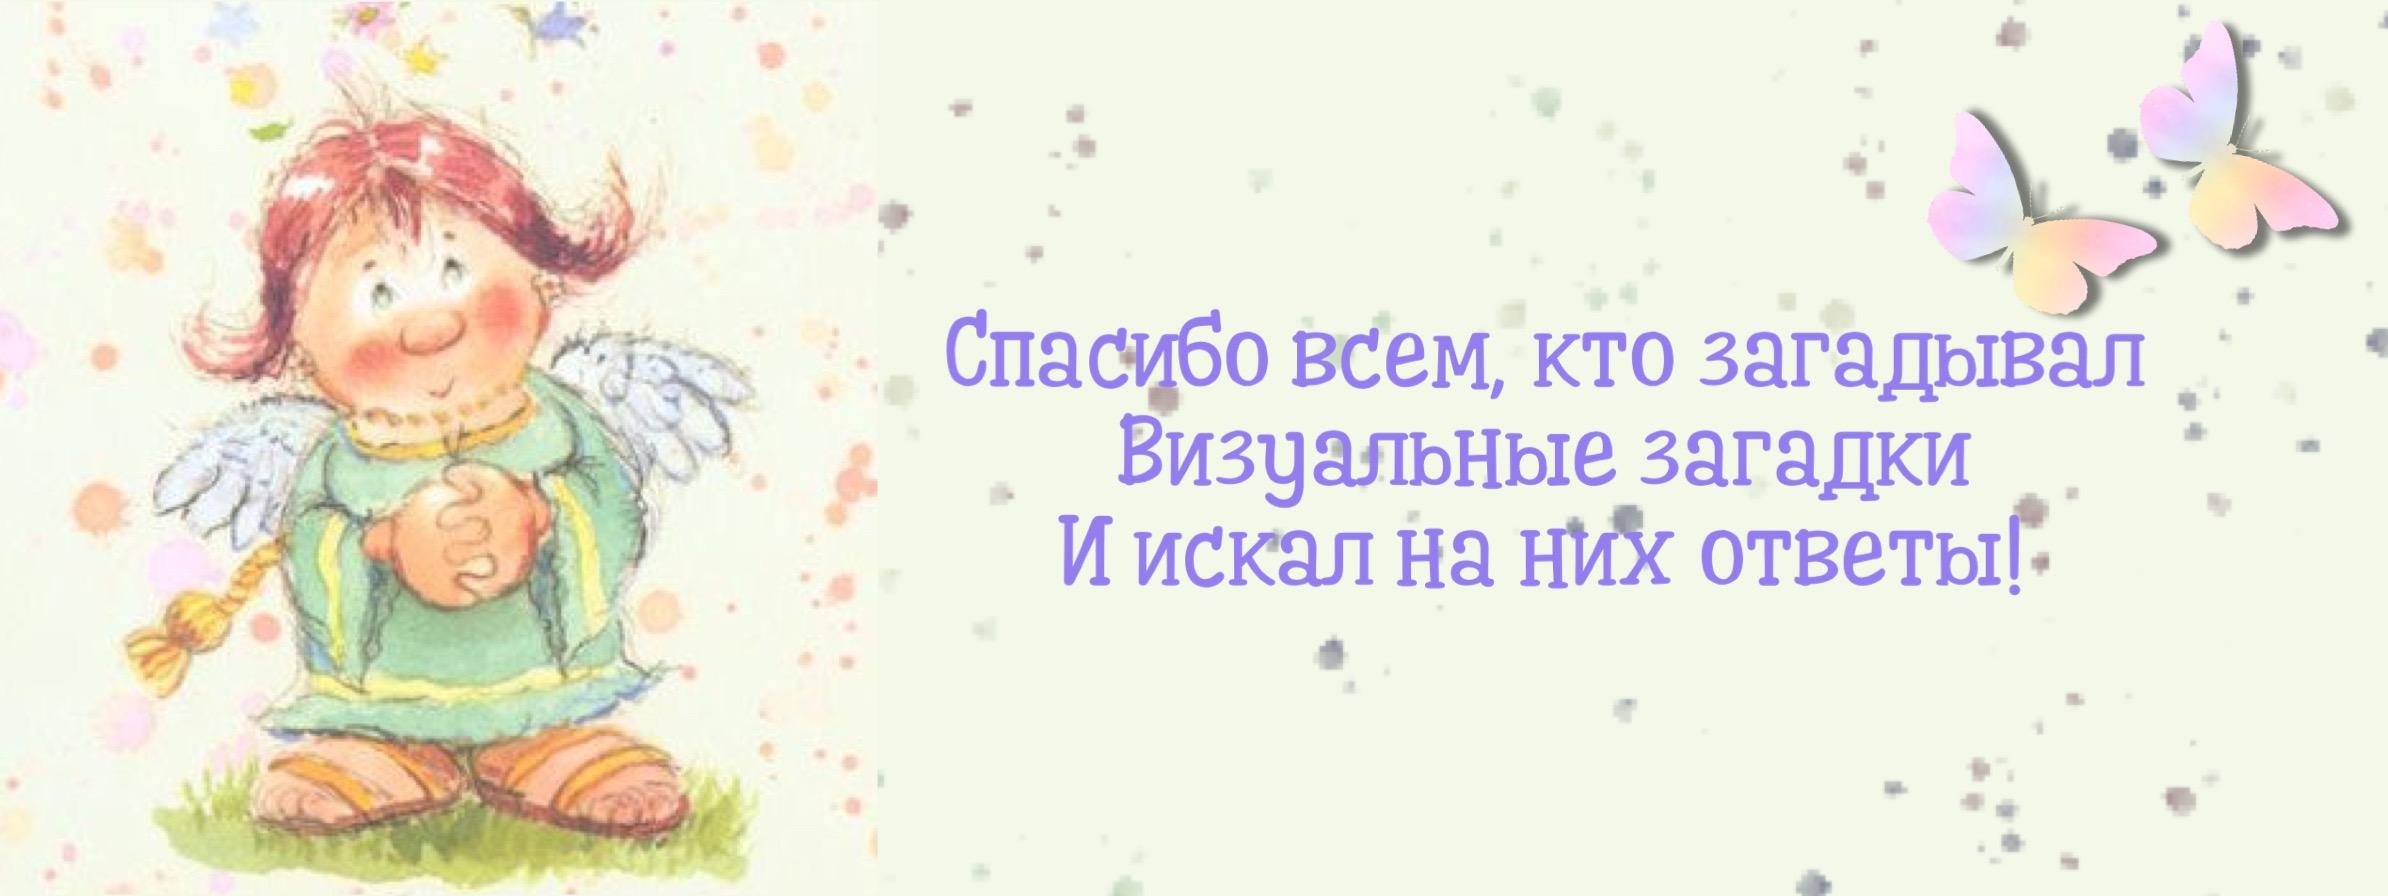 http://s8.uploads.ru/MtpbE.jpg